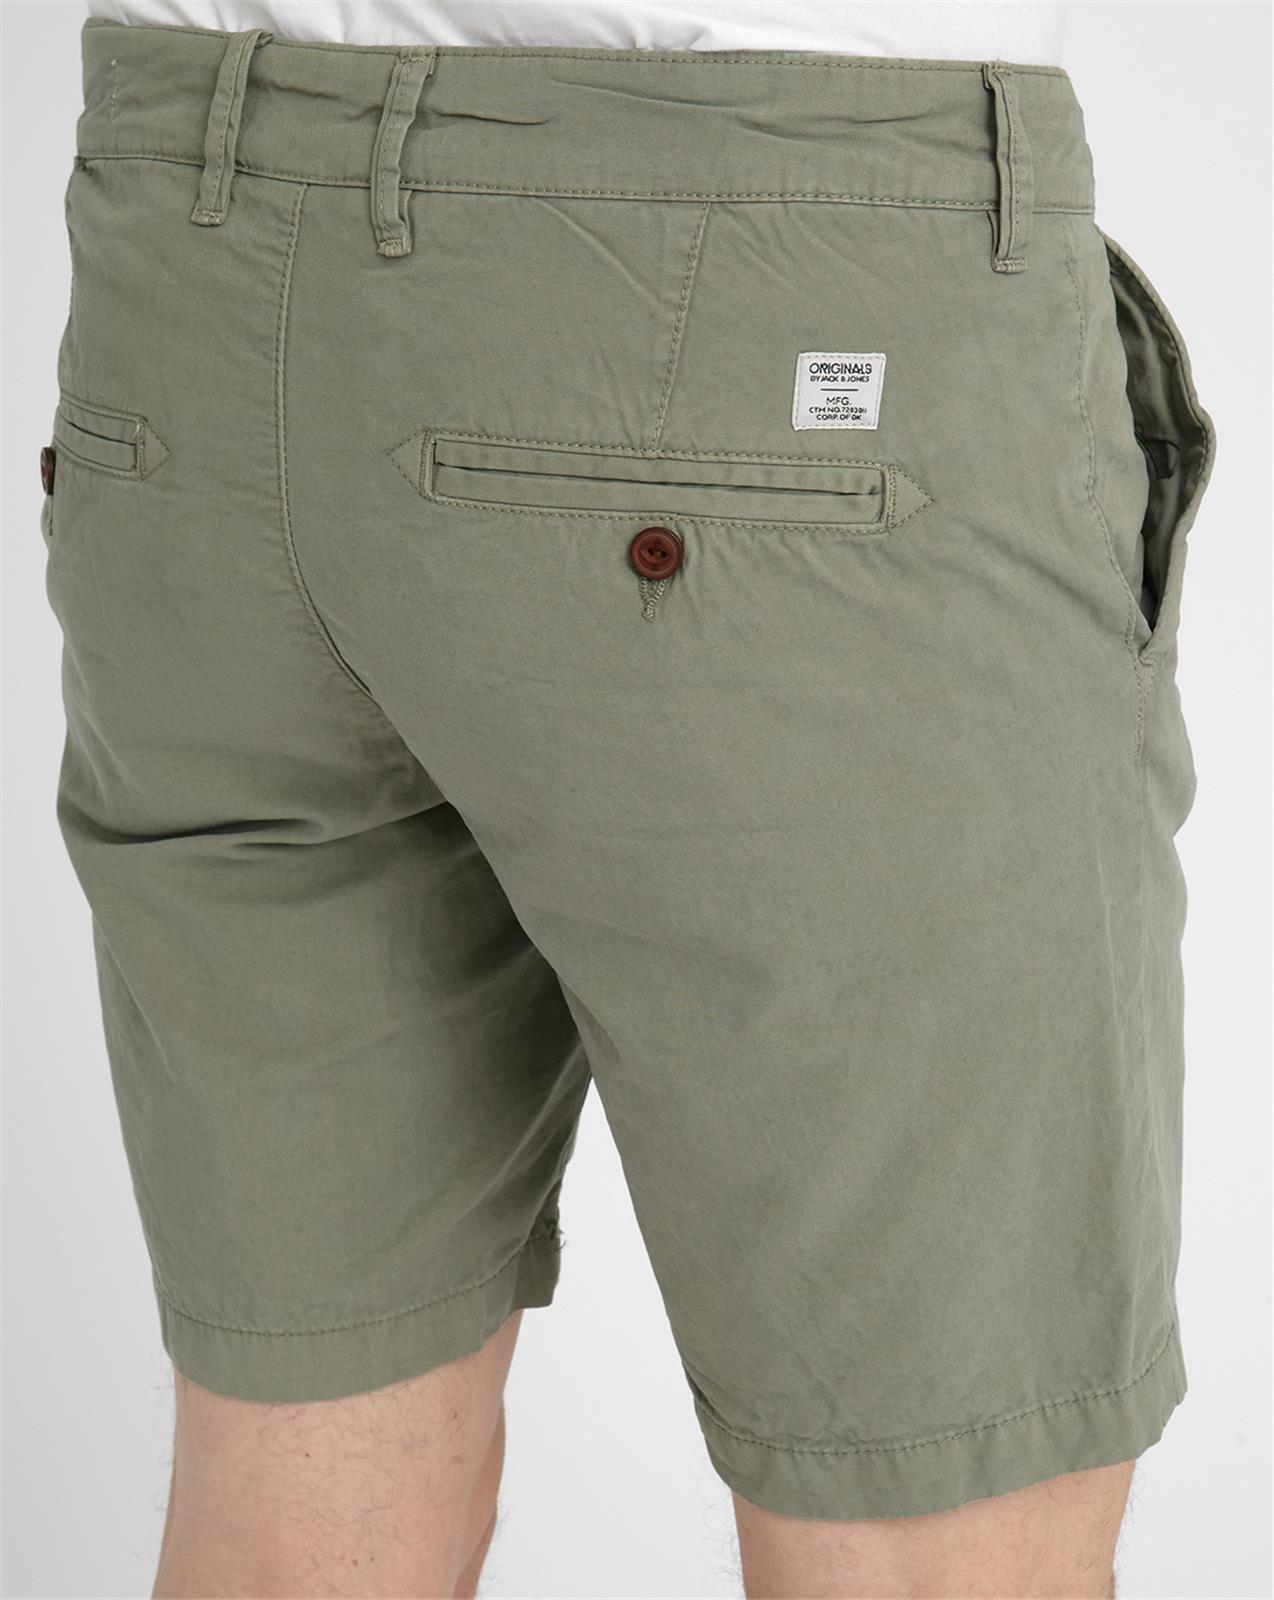 jack jones grey din chino cotton bermuda shorts in green for men. Black Bedroom Furniture Sets. Home Design Ideas